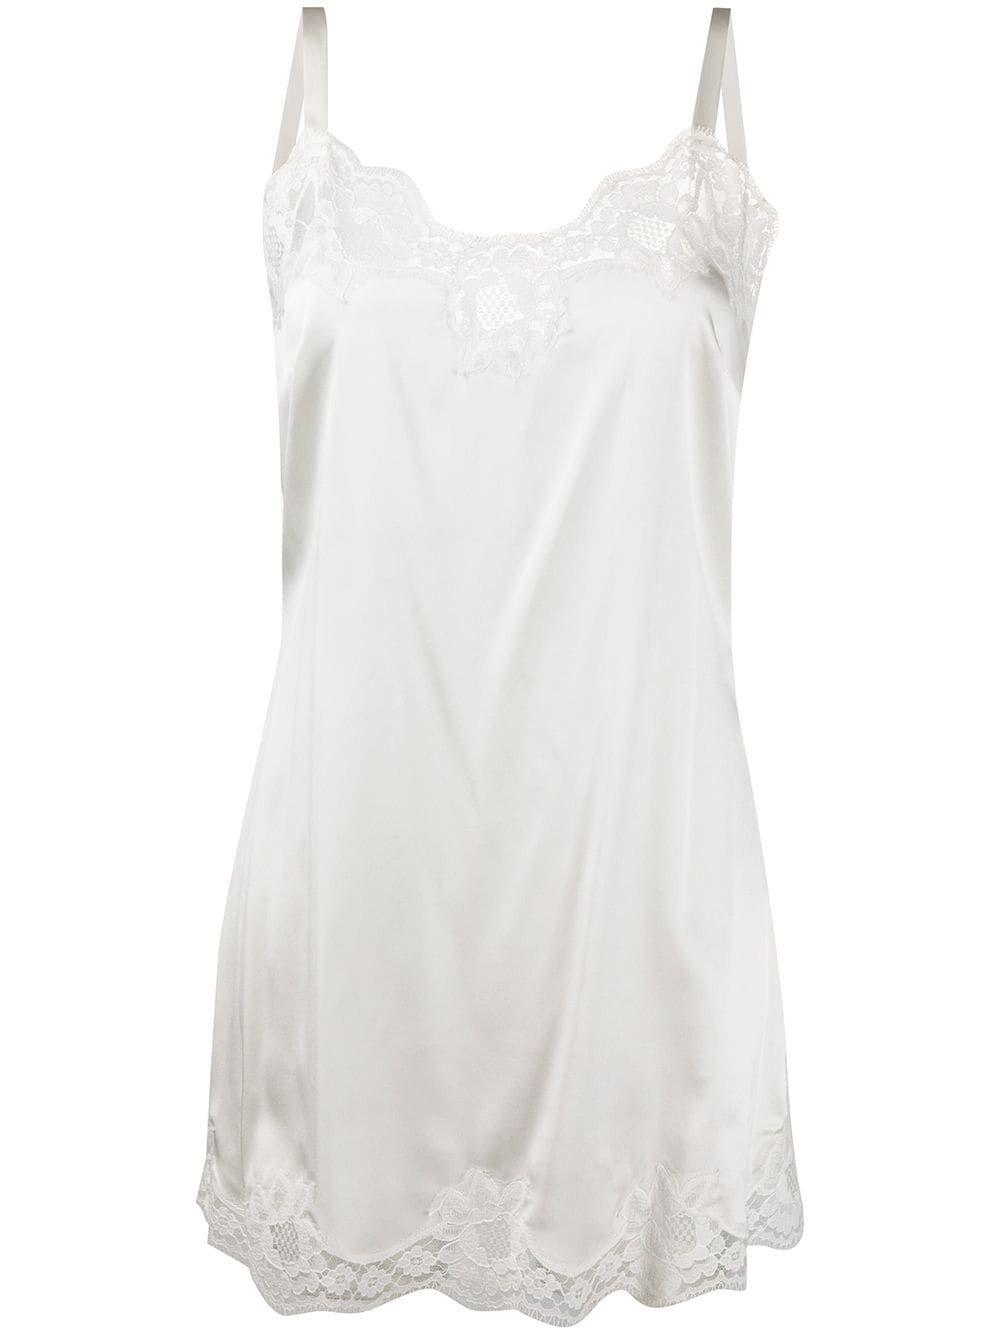 Dolce Gabbana Lace Detail Slip Dress Farfetch In 2021 White Slip Dress Slip Dress Clothes Design [ 1334 x 1000 Pixel ]